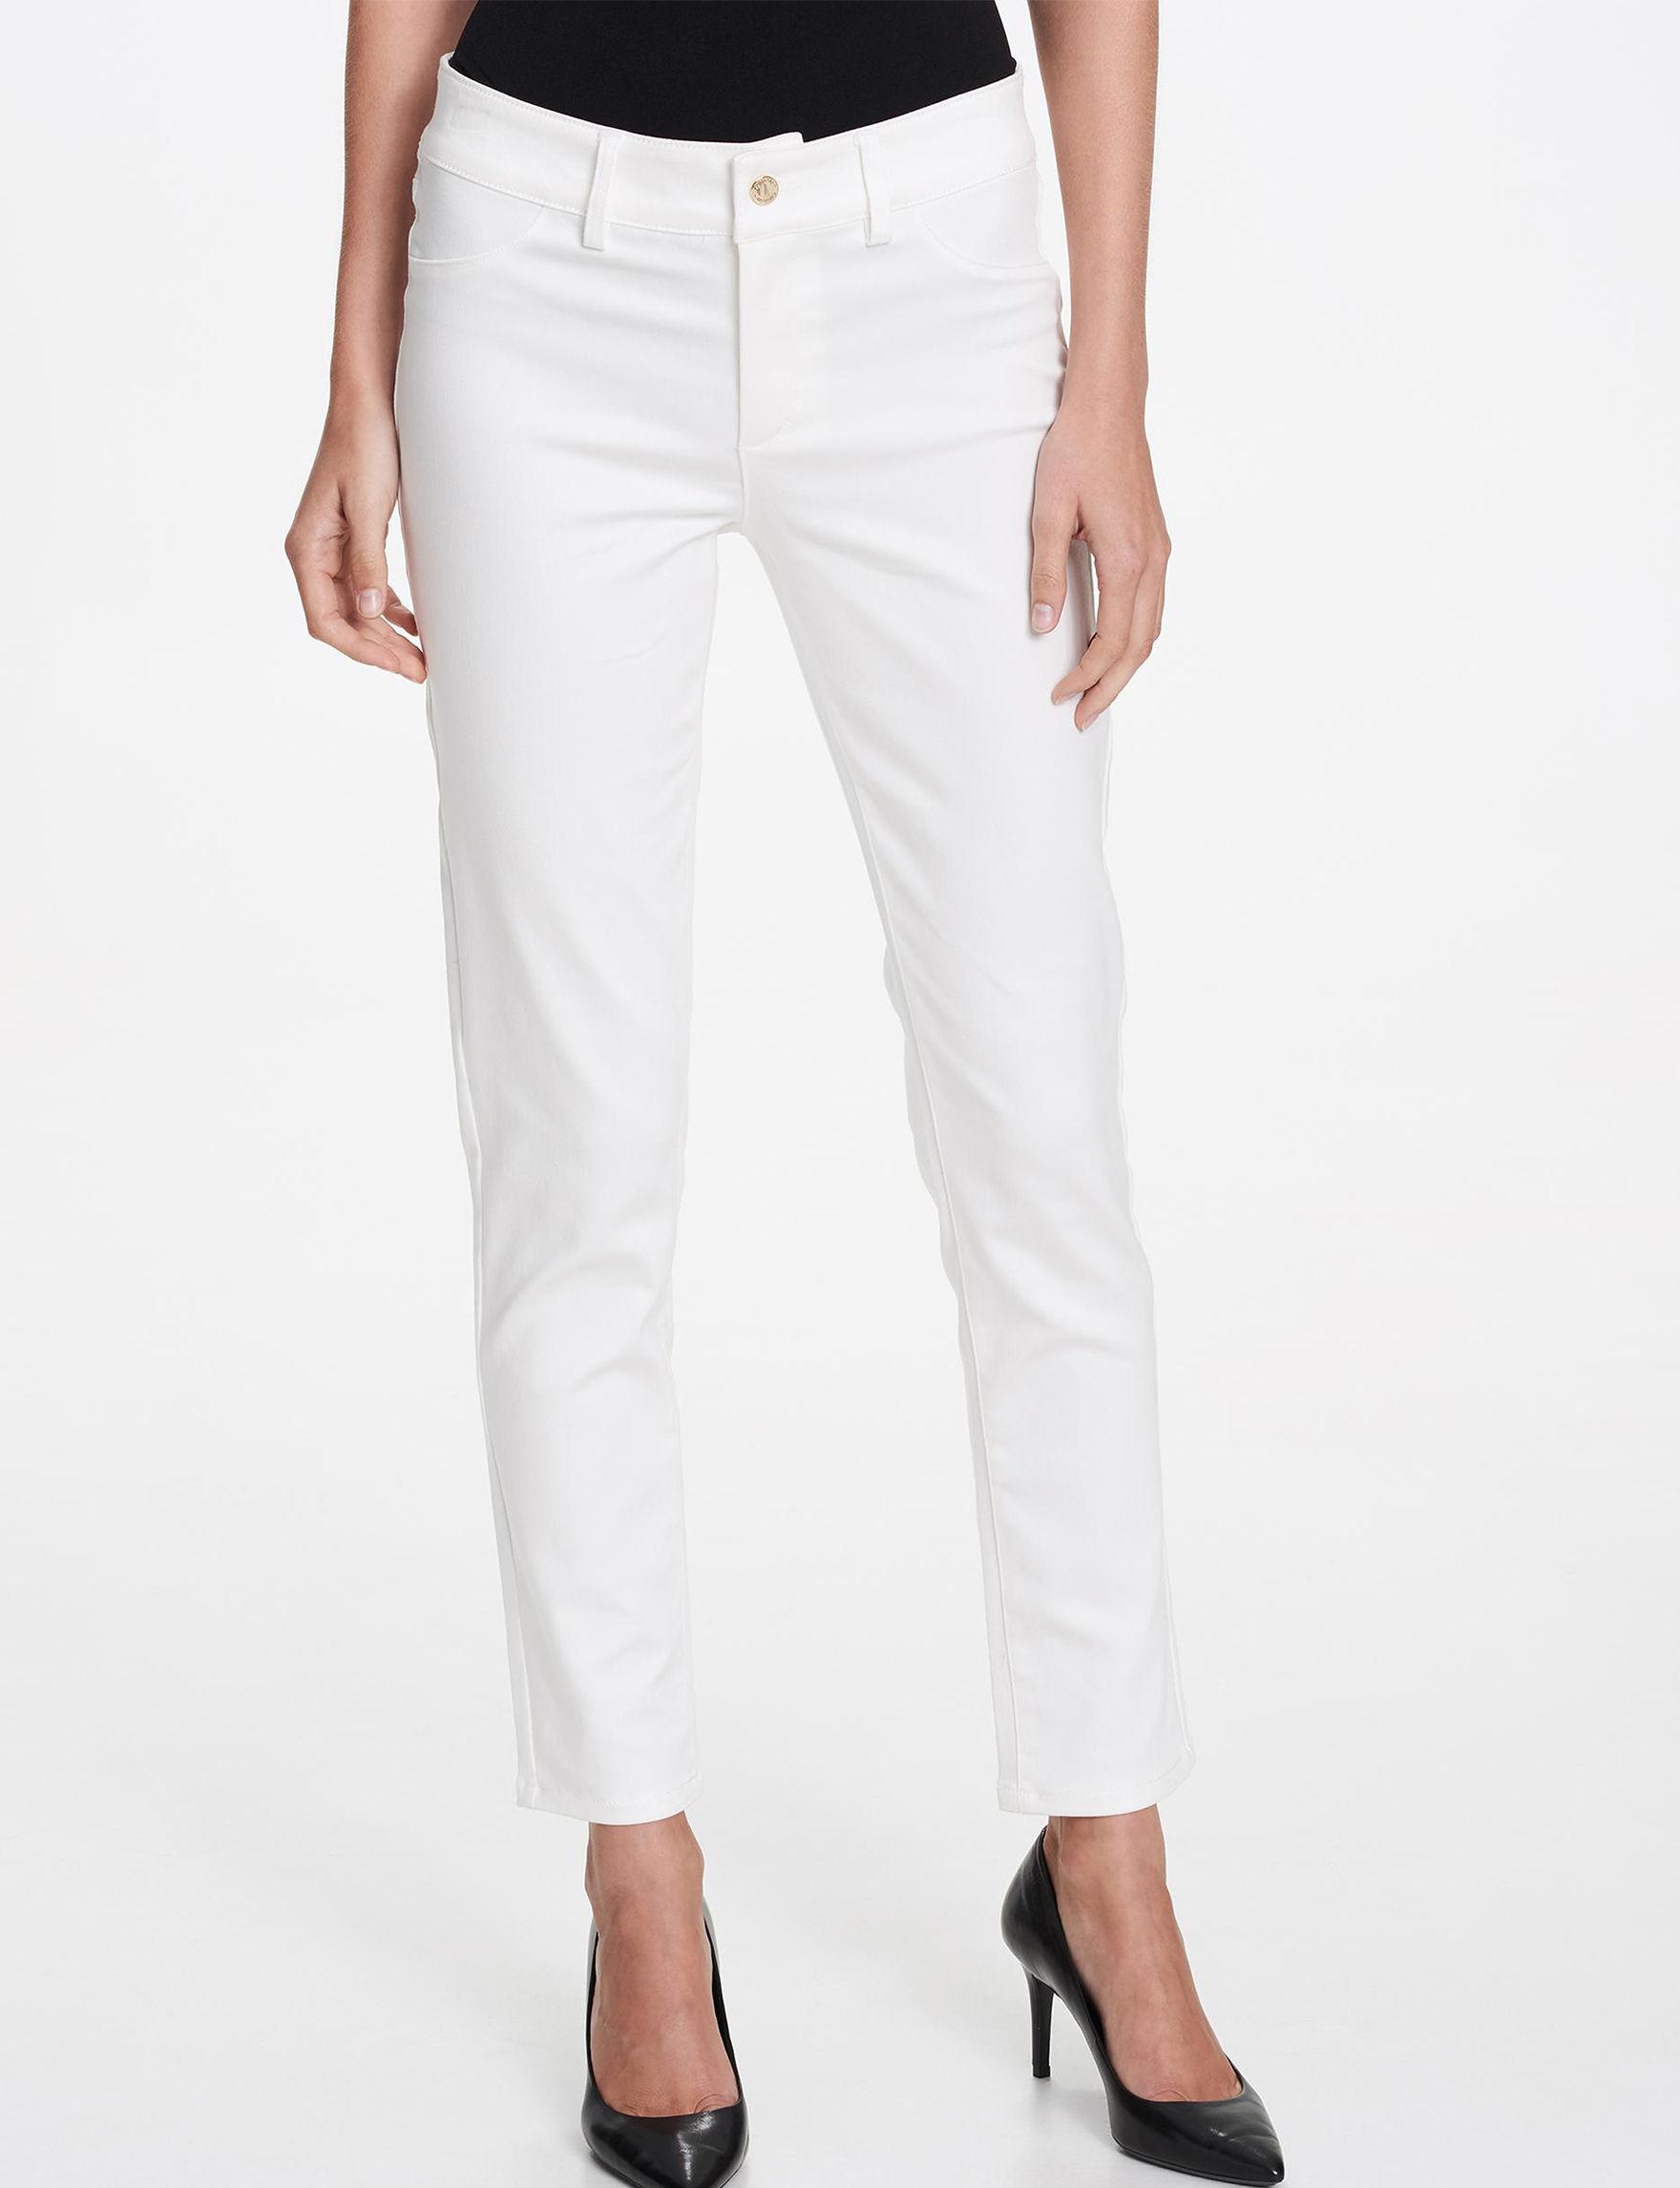 Calvin Klein White Soft Pants